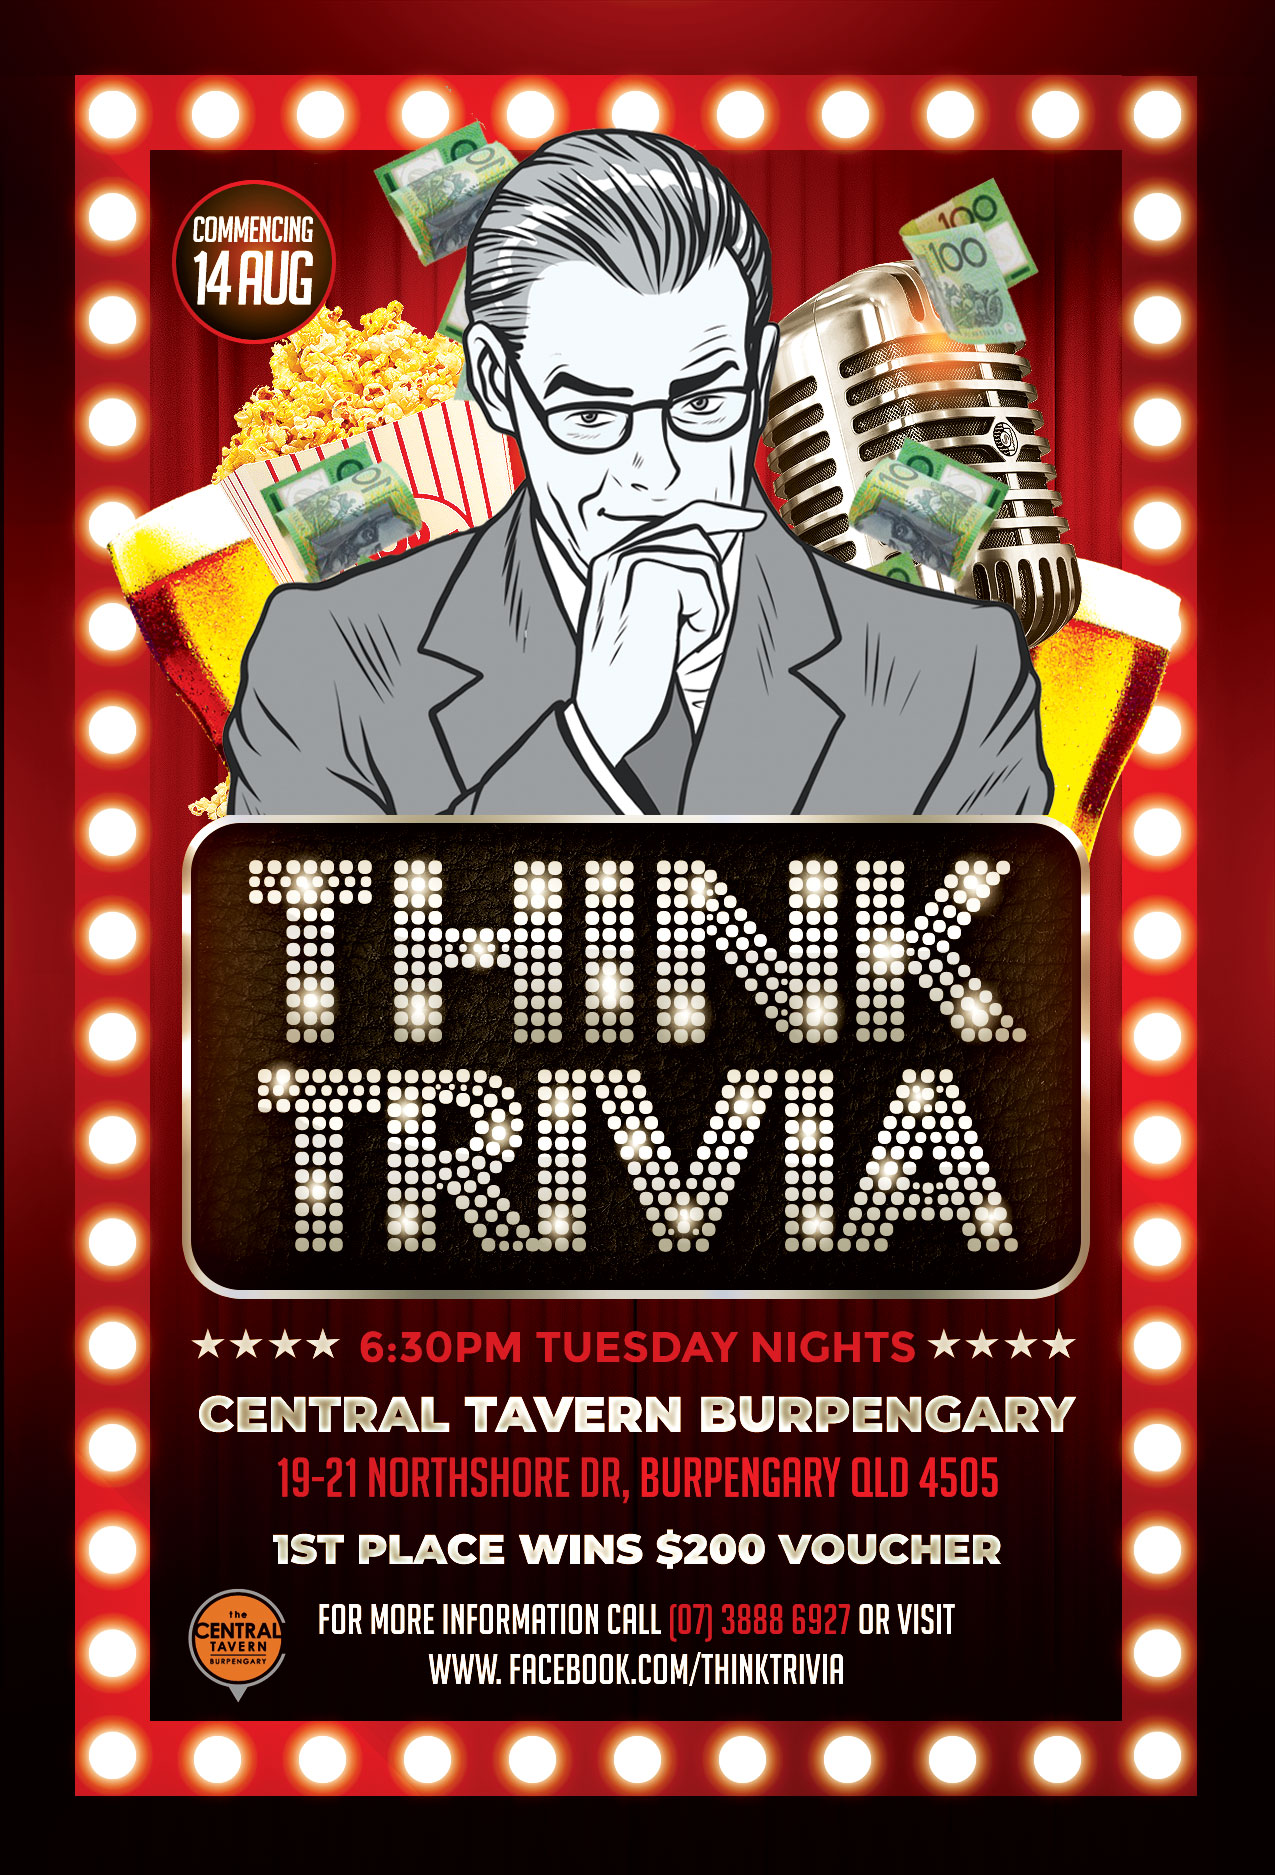 Central Tavern Burpengary - Tuesday Night Trivia @ Central Tavern Burpengary | Burpengary | Queensland | Australia